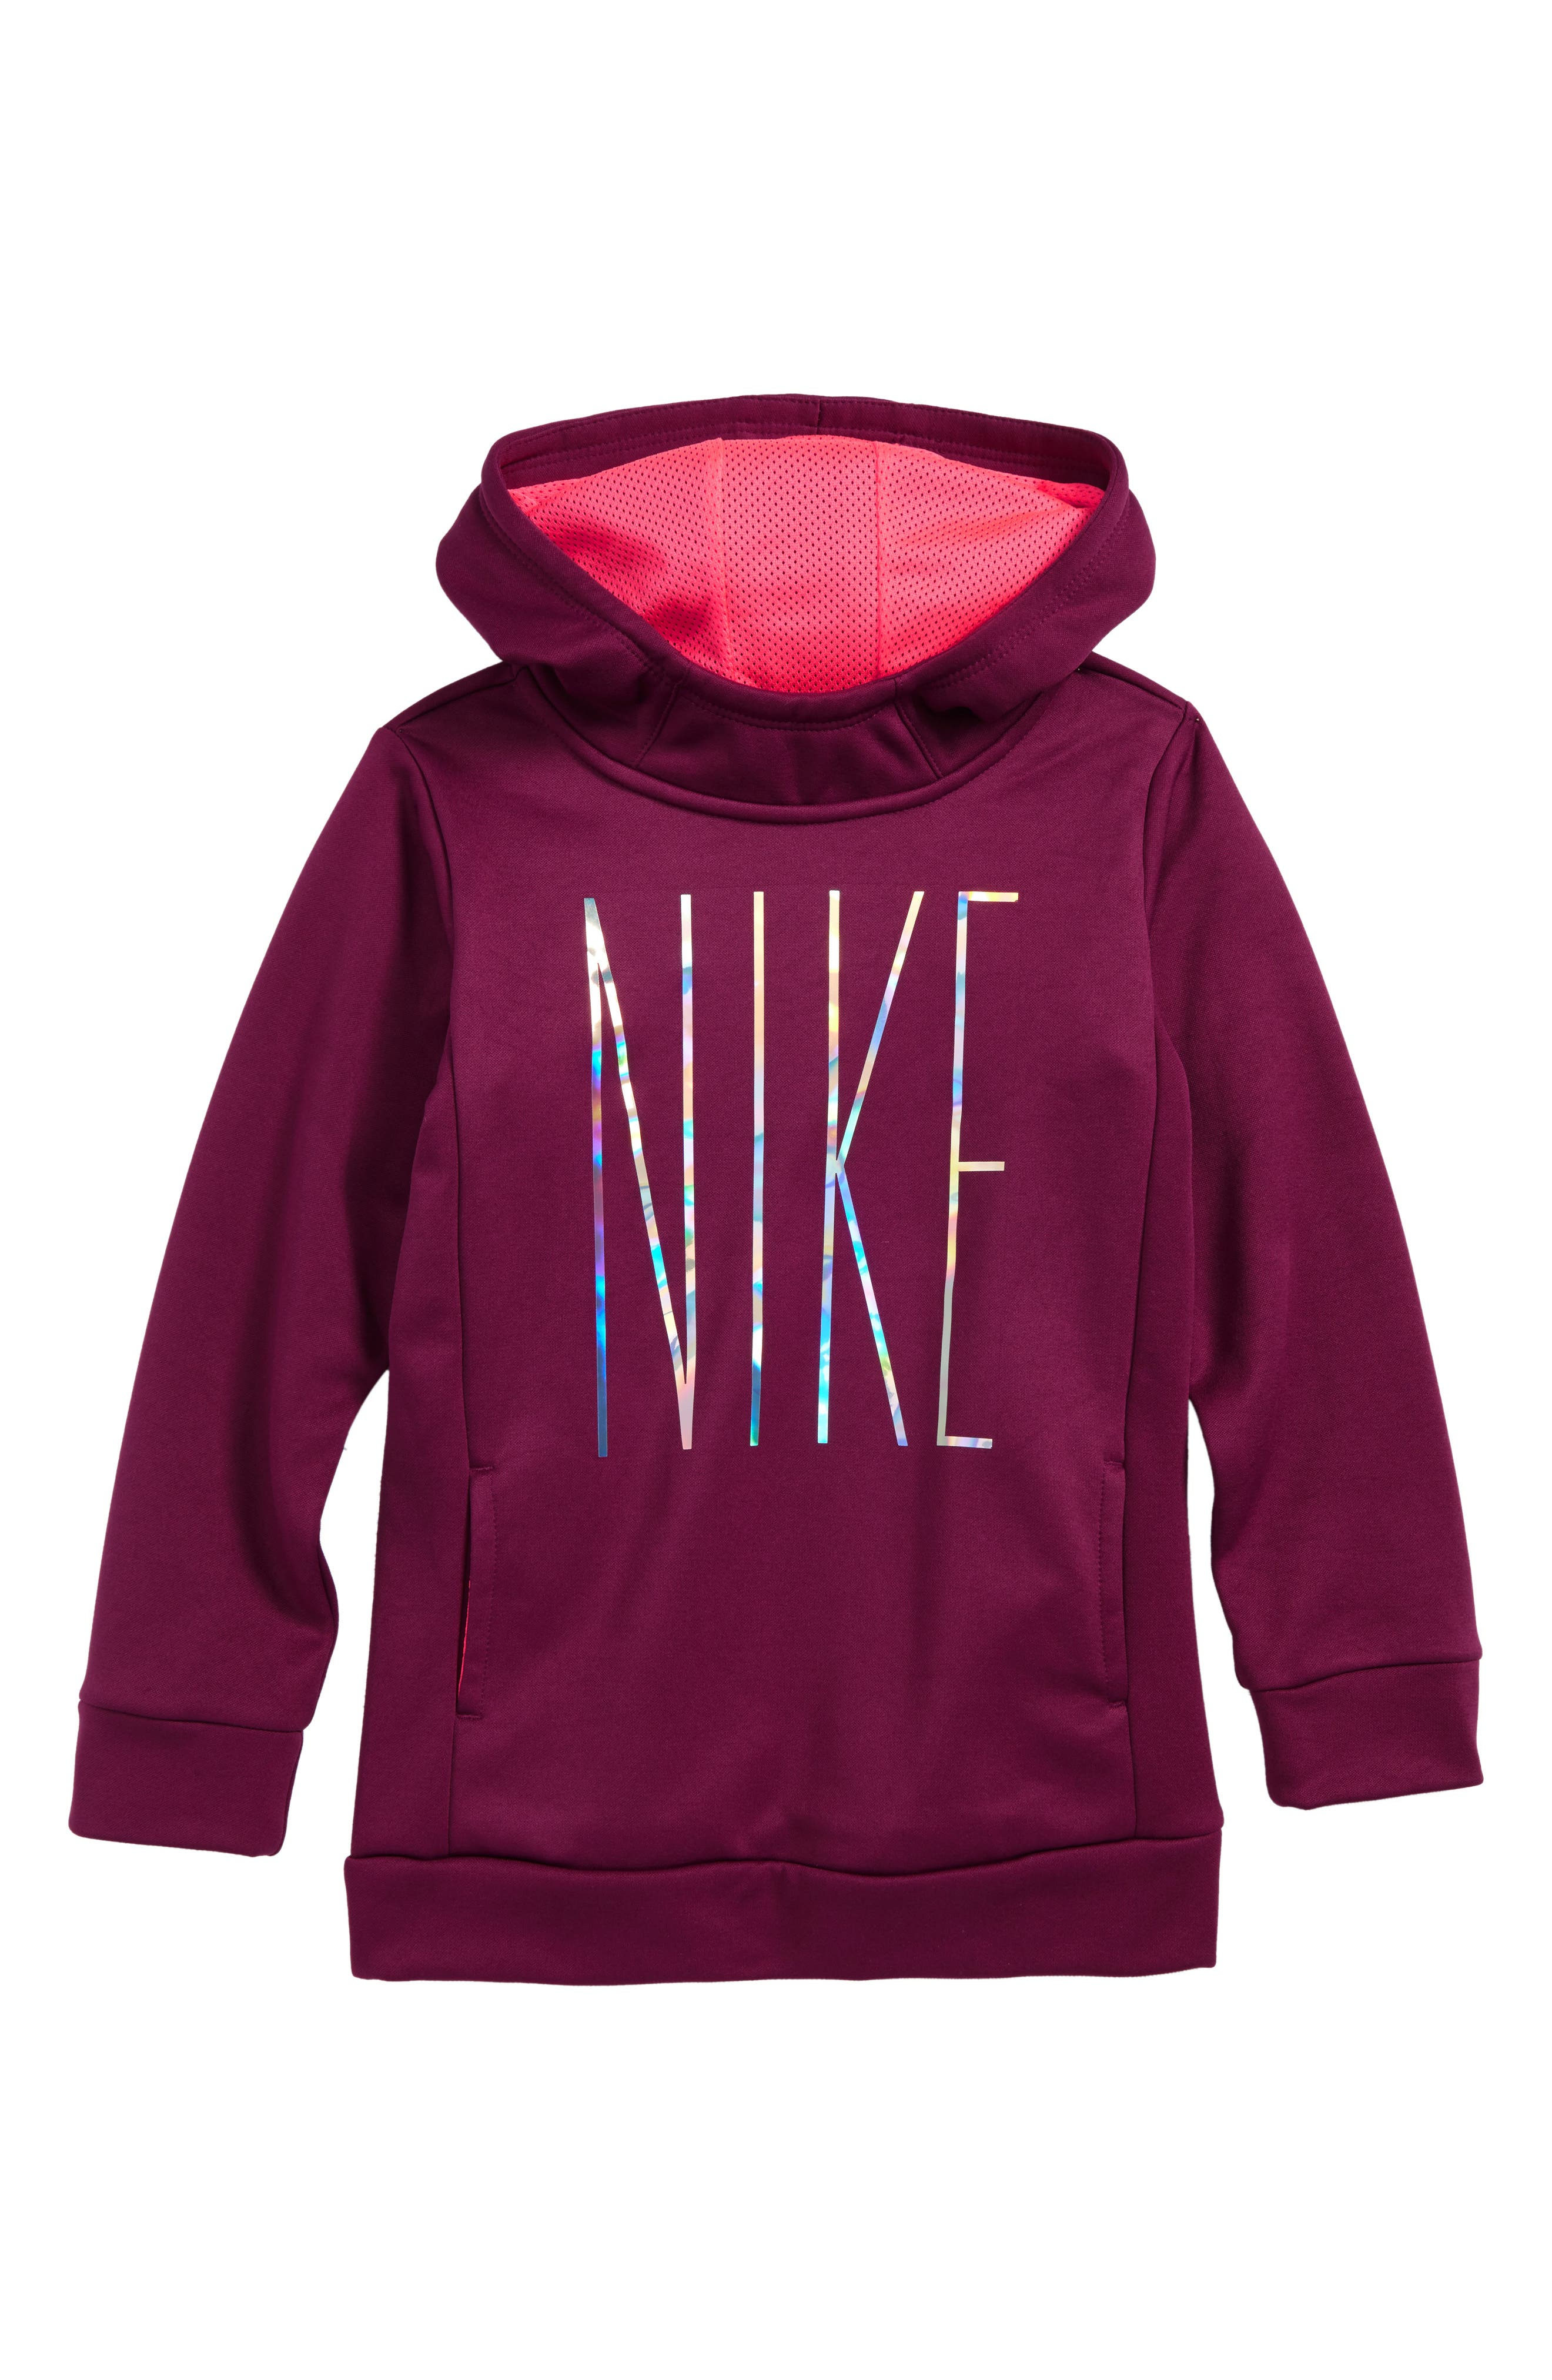 Main Image - Nike Therma-FIT Hoodie (Toddler Girls & Little Girls)